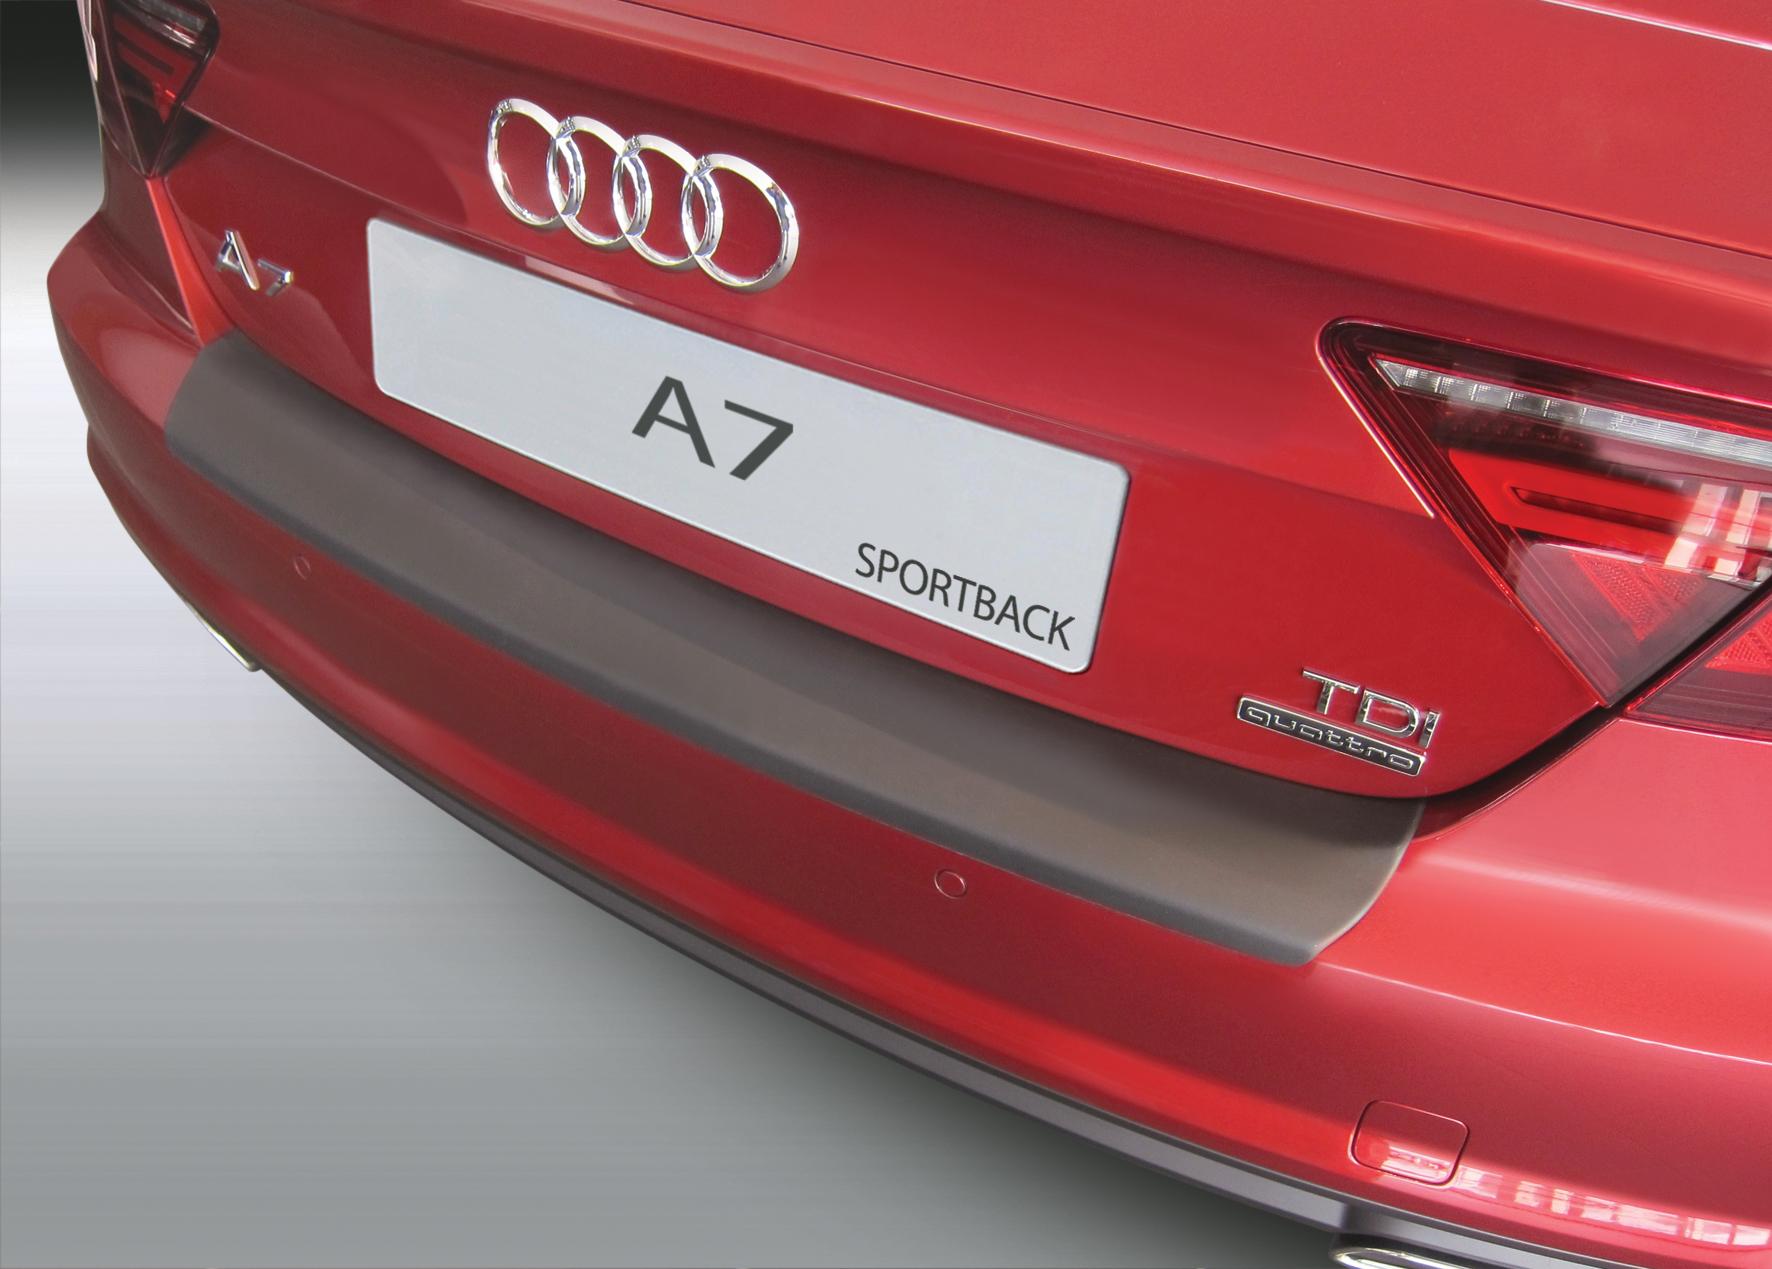 Накладка на задний бампер Audi A7, лифтбек, 2016-2018